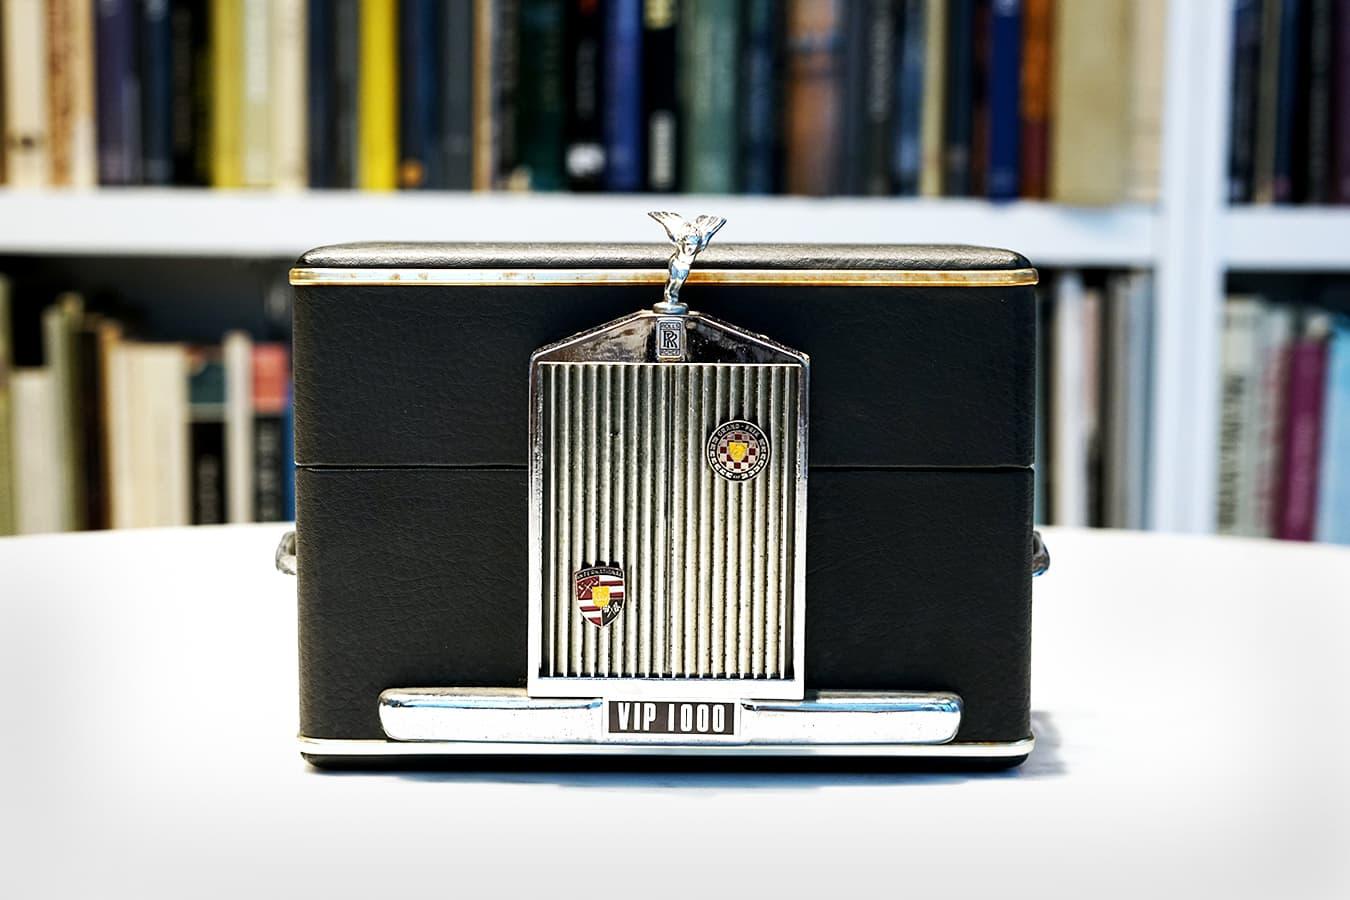 Retrospect: The Rolls-Royce 1960 VIP 1000 Decanter Set